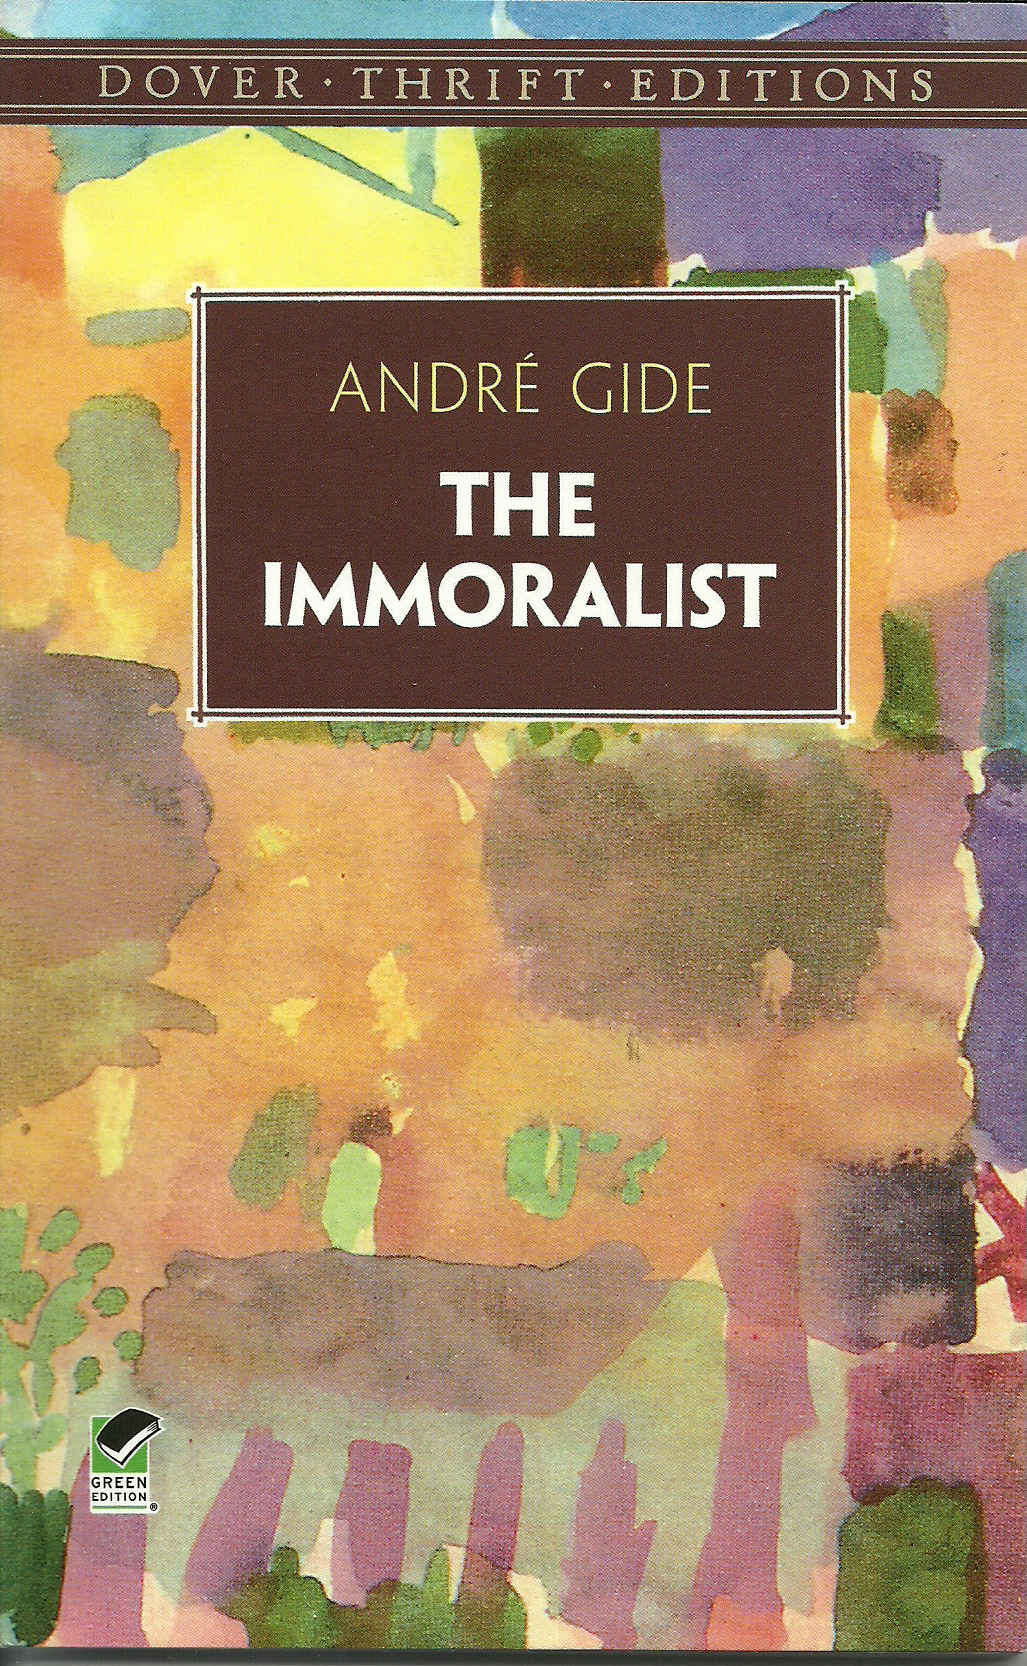 Homoertic ambiguity in the immoralist